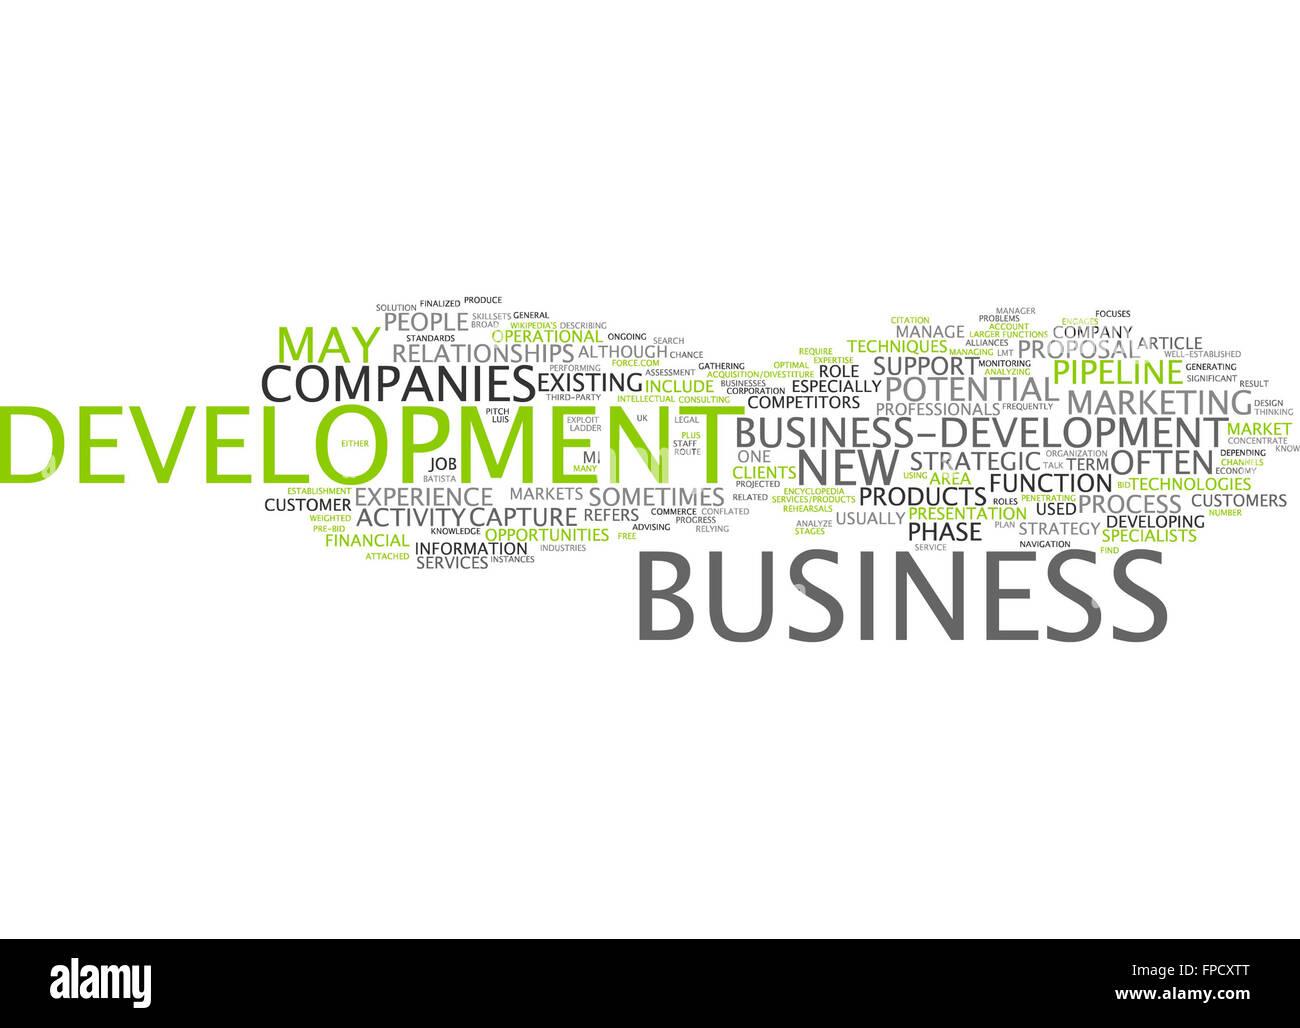 business development bud company companies - Stock Image